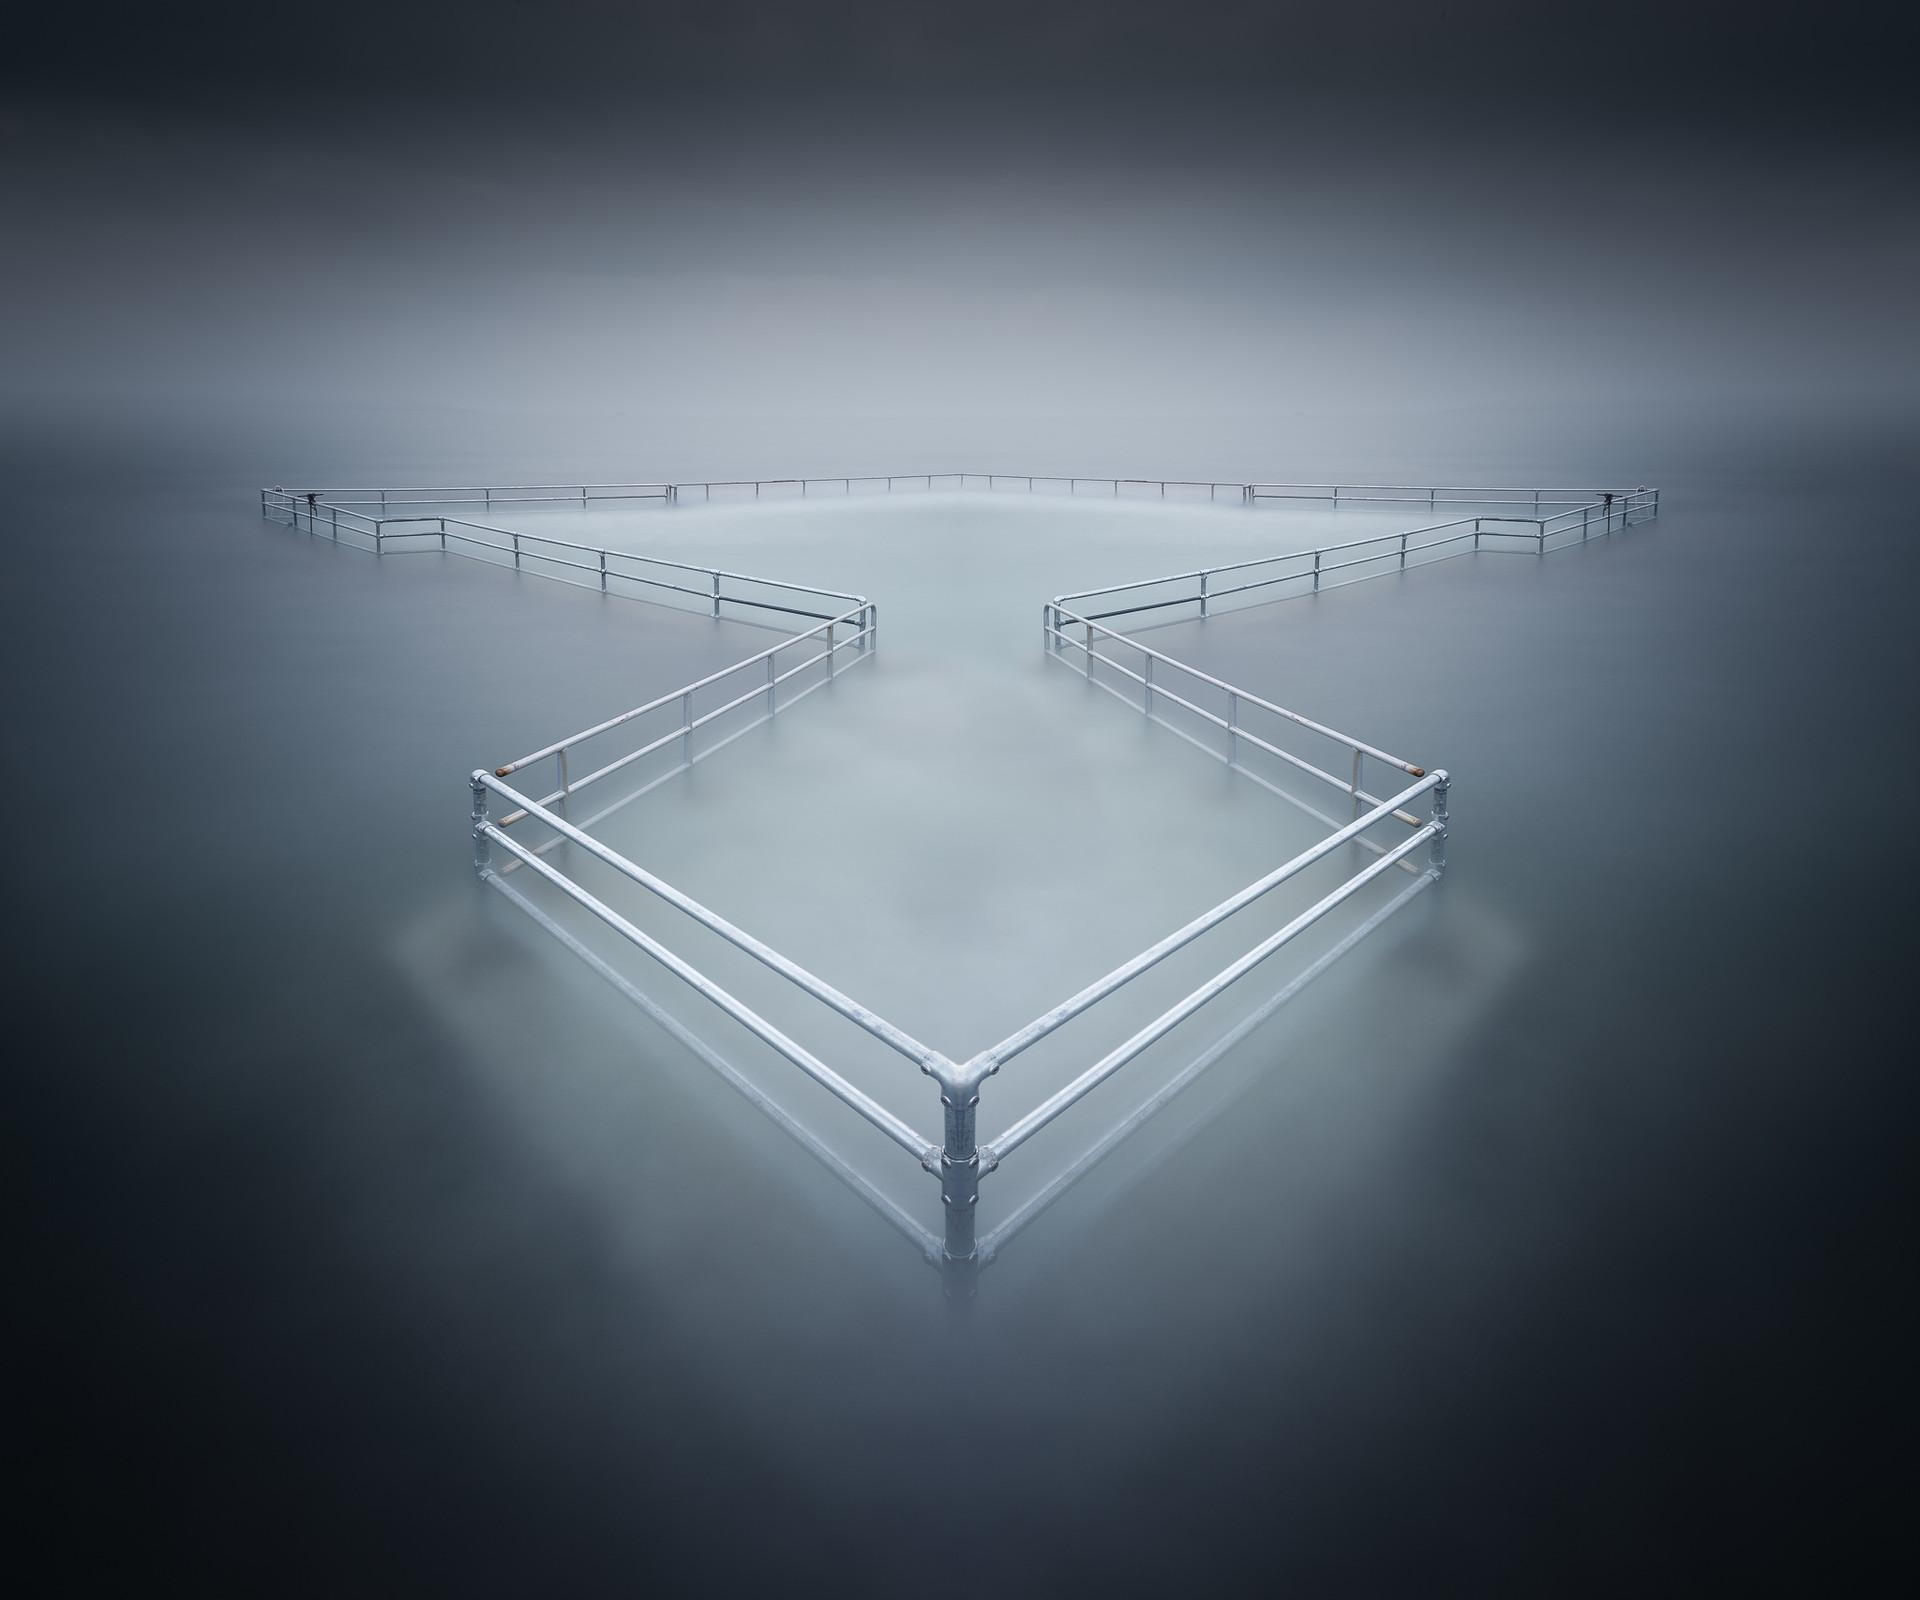 infinity-pool_40409281555_o.jpg